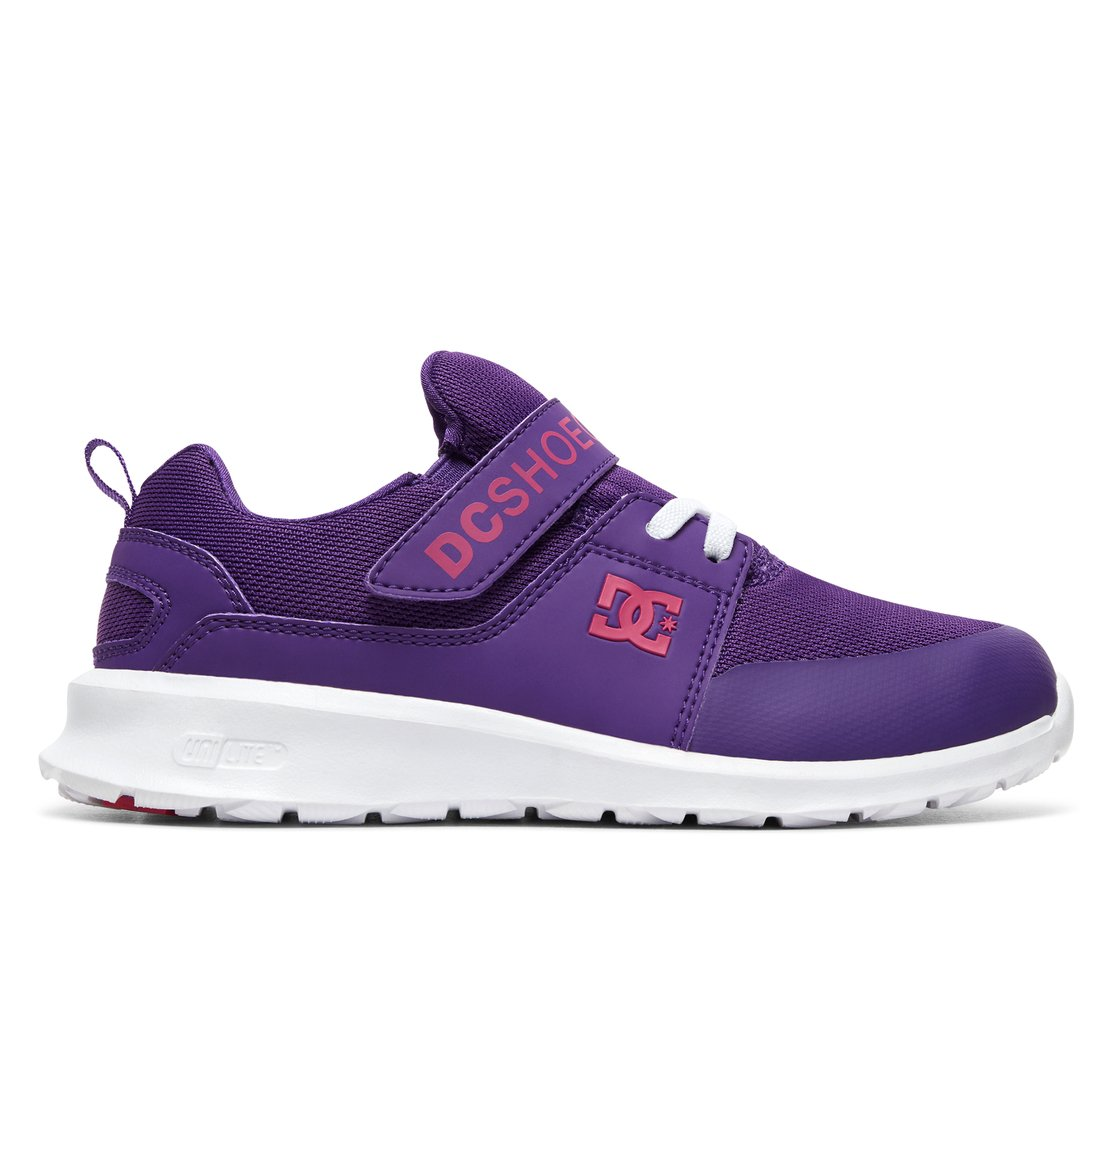 Kid's Heathrow Prestige SE Shoes